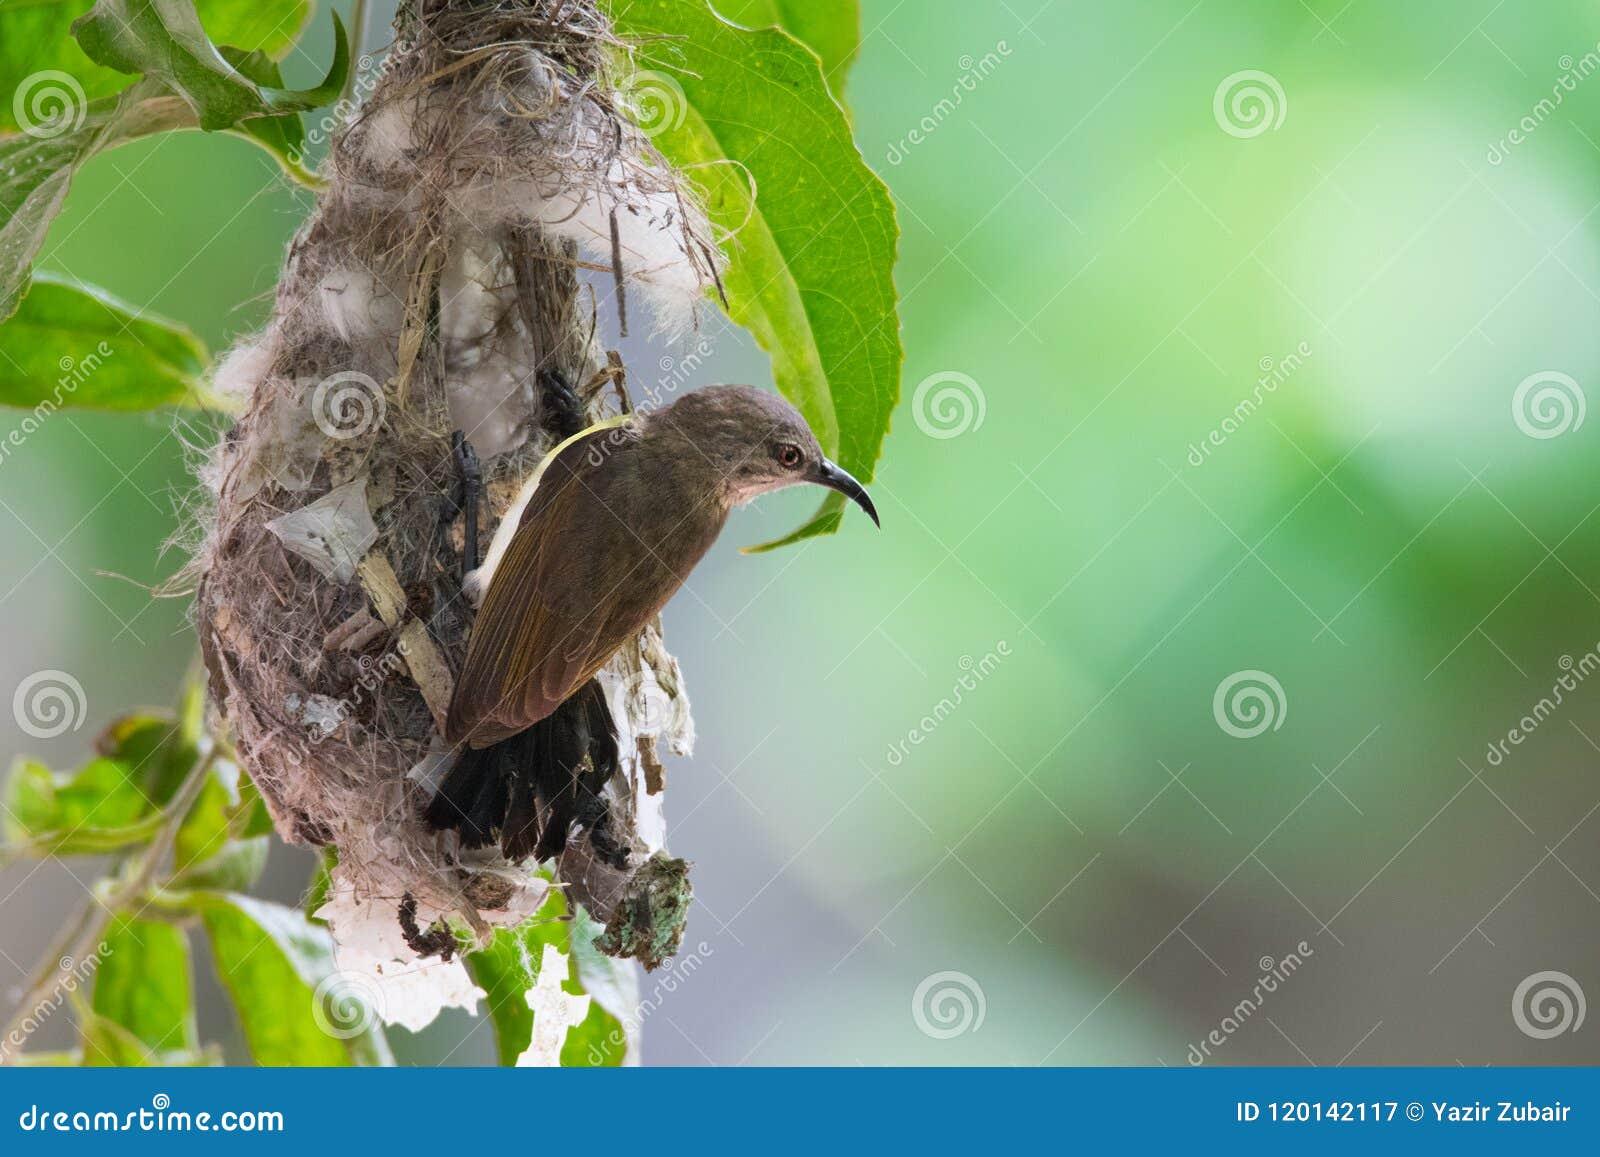 Sunbird in a nest